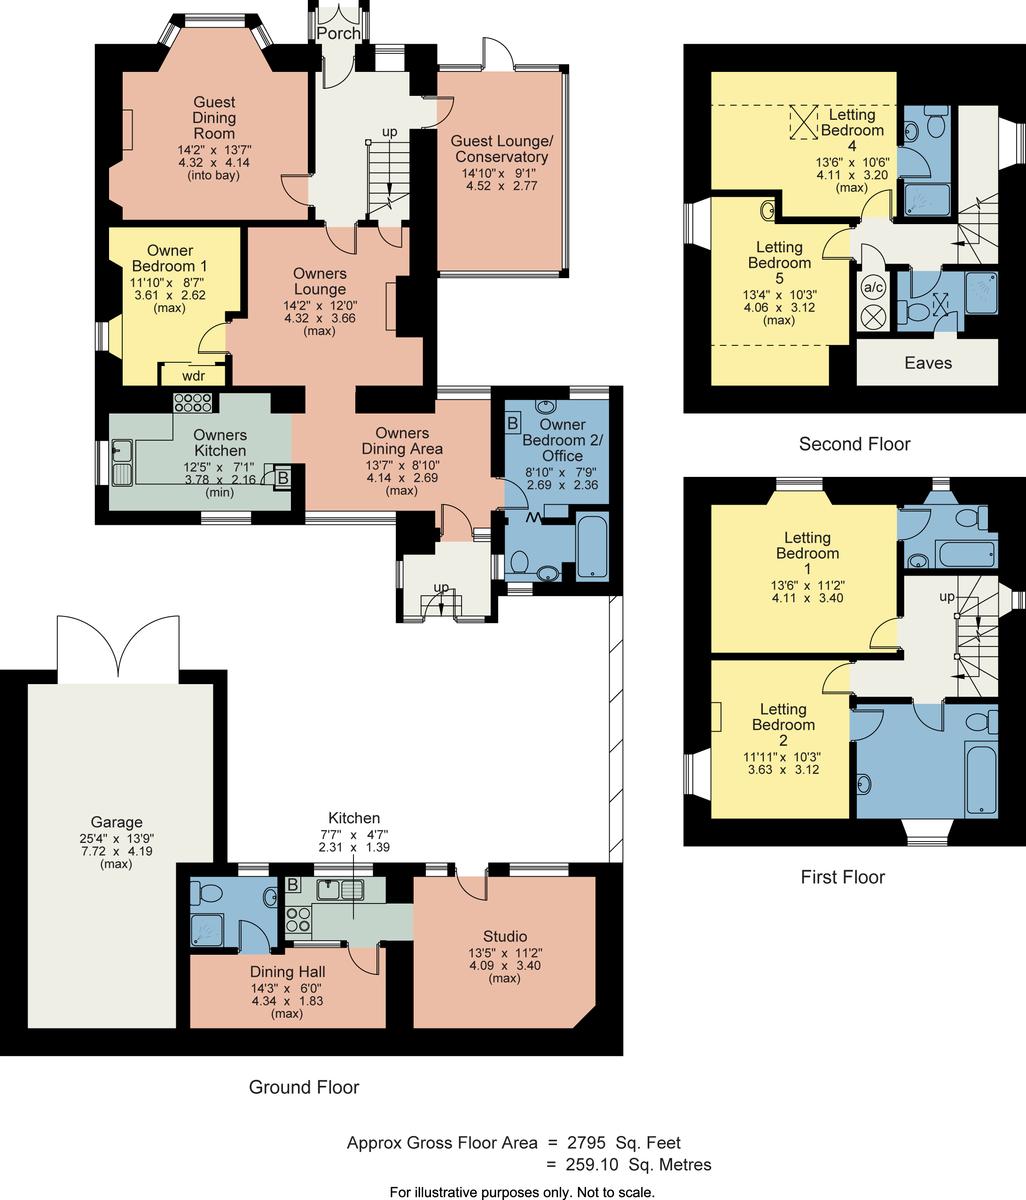 Floorplan Lindisfarne Guest House, Sunny Bank Road, Windermere, Cumbria, LA23 2EN